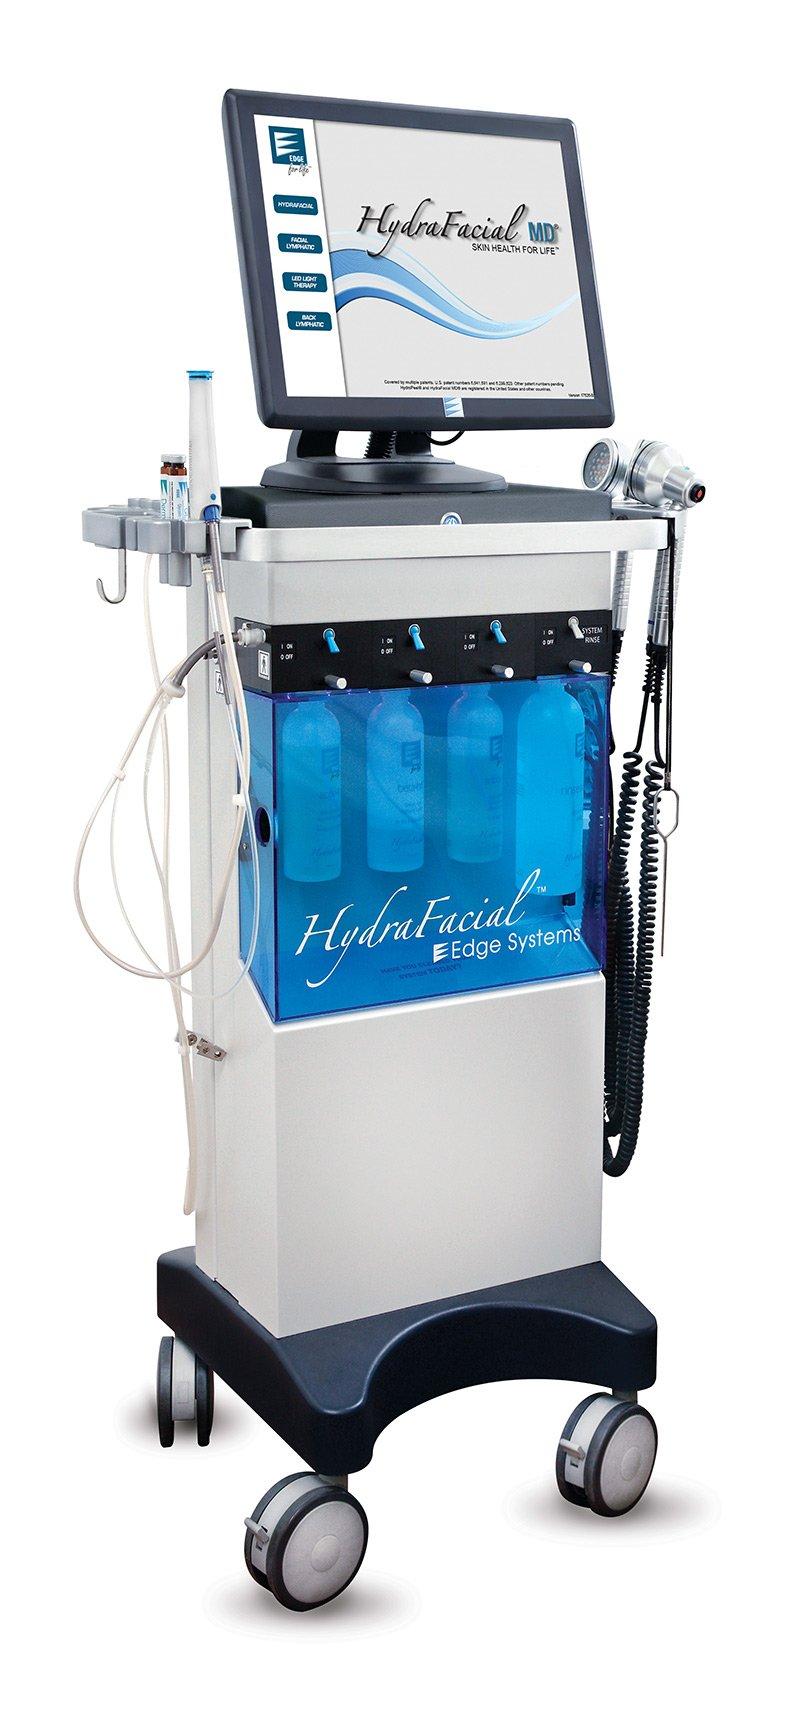 apparat stand - Аппарат для чистки лица HydraFacial MD® - купить в Москве